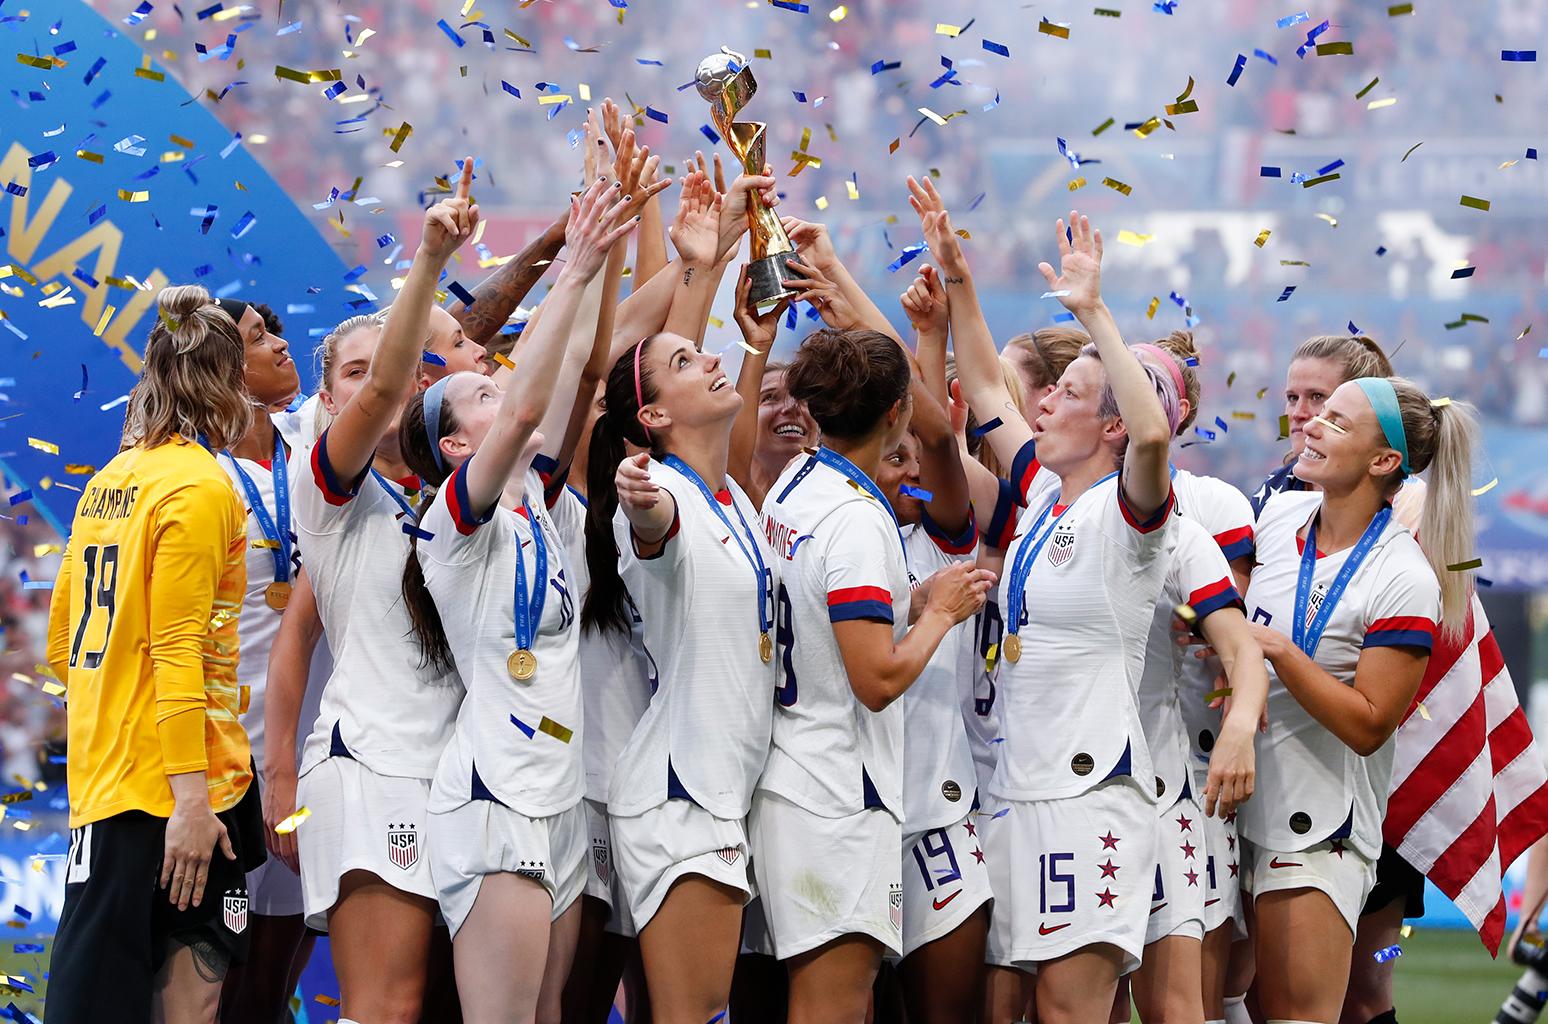 womens football teams arrive - HD1548×1024